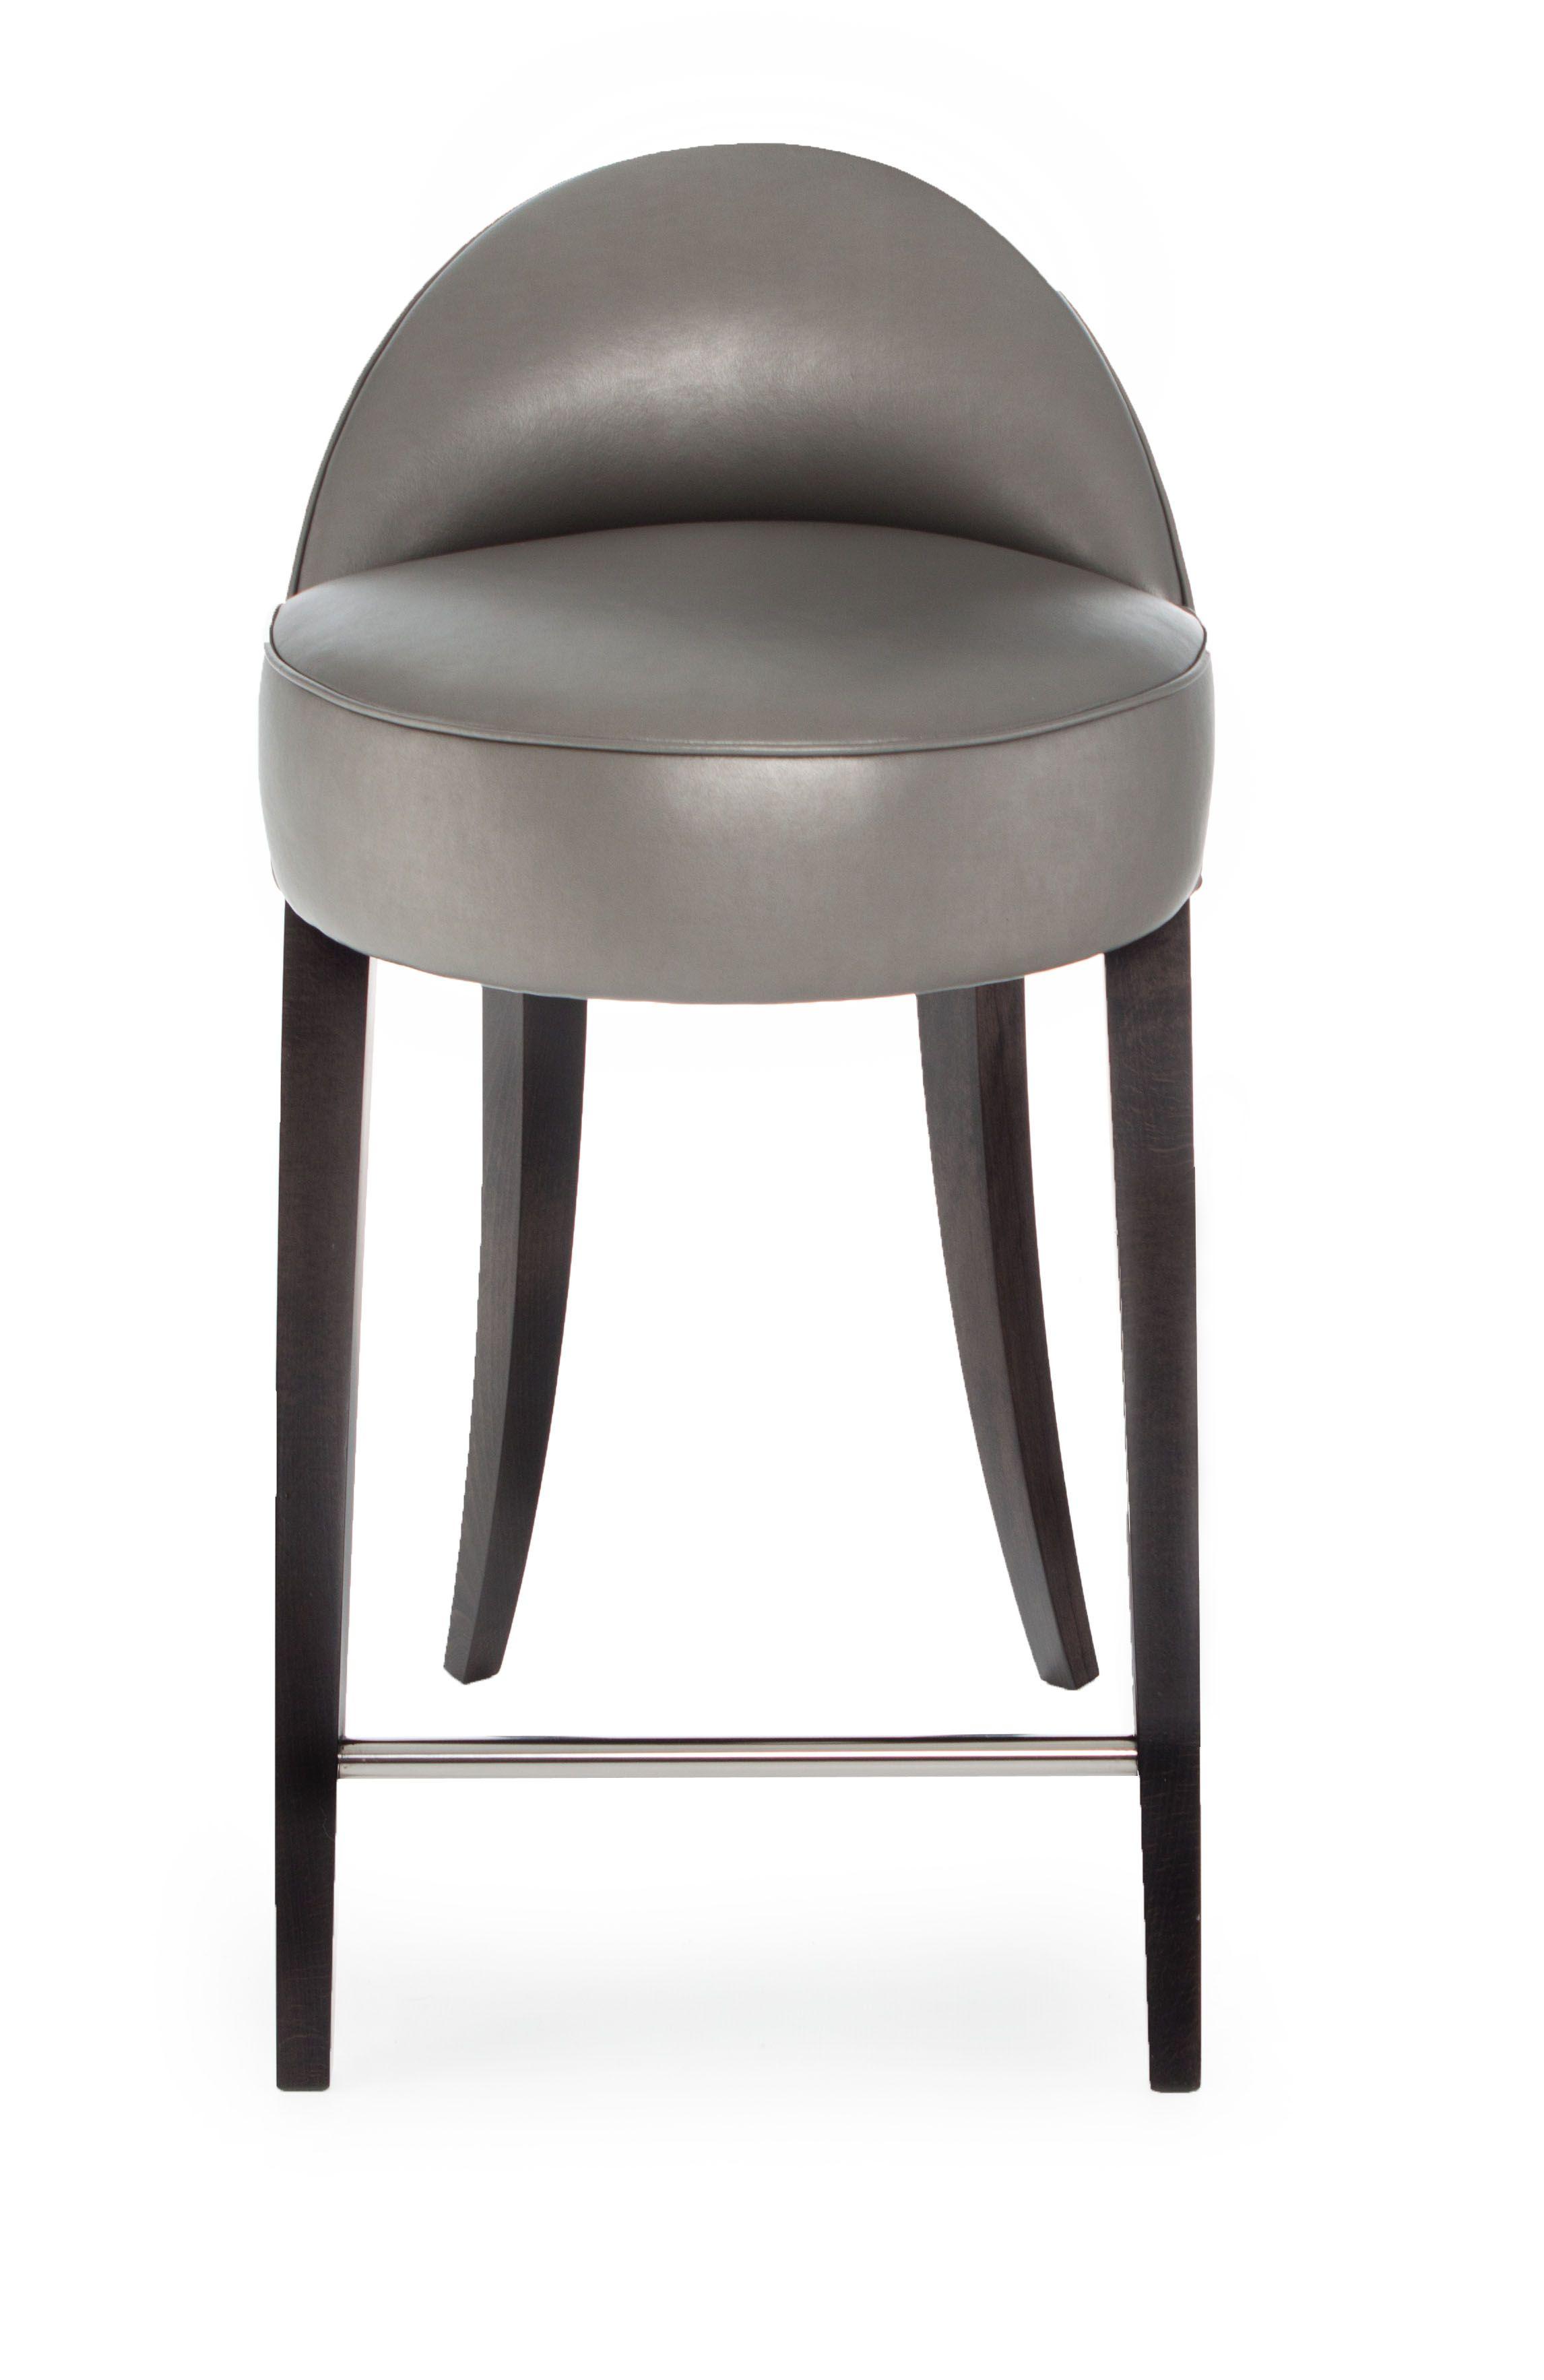 Bespoke Bar Stools | The Sofa & Chair Company | Interior ...